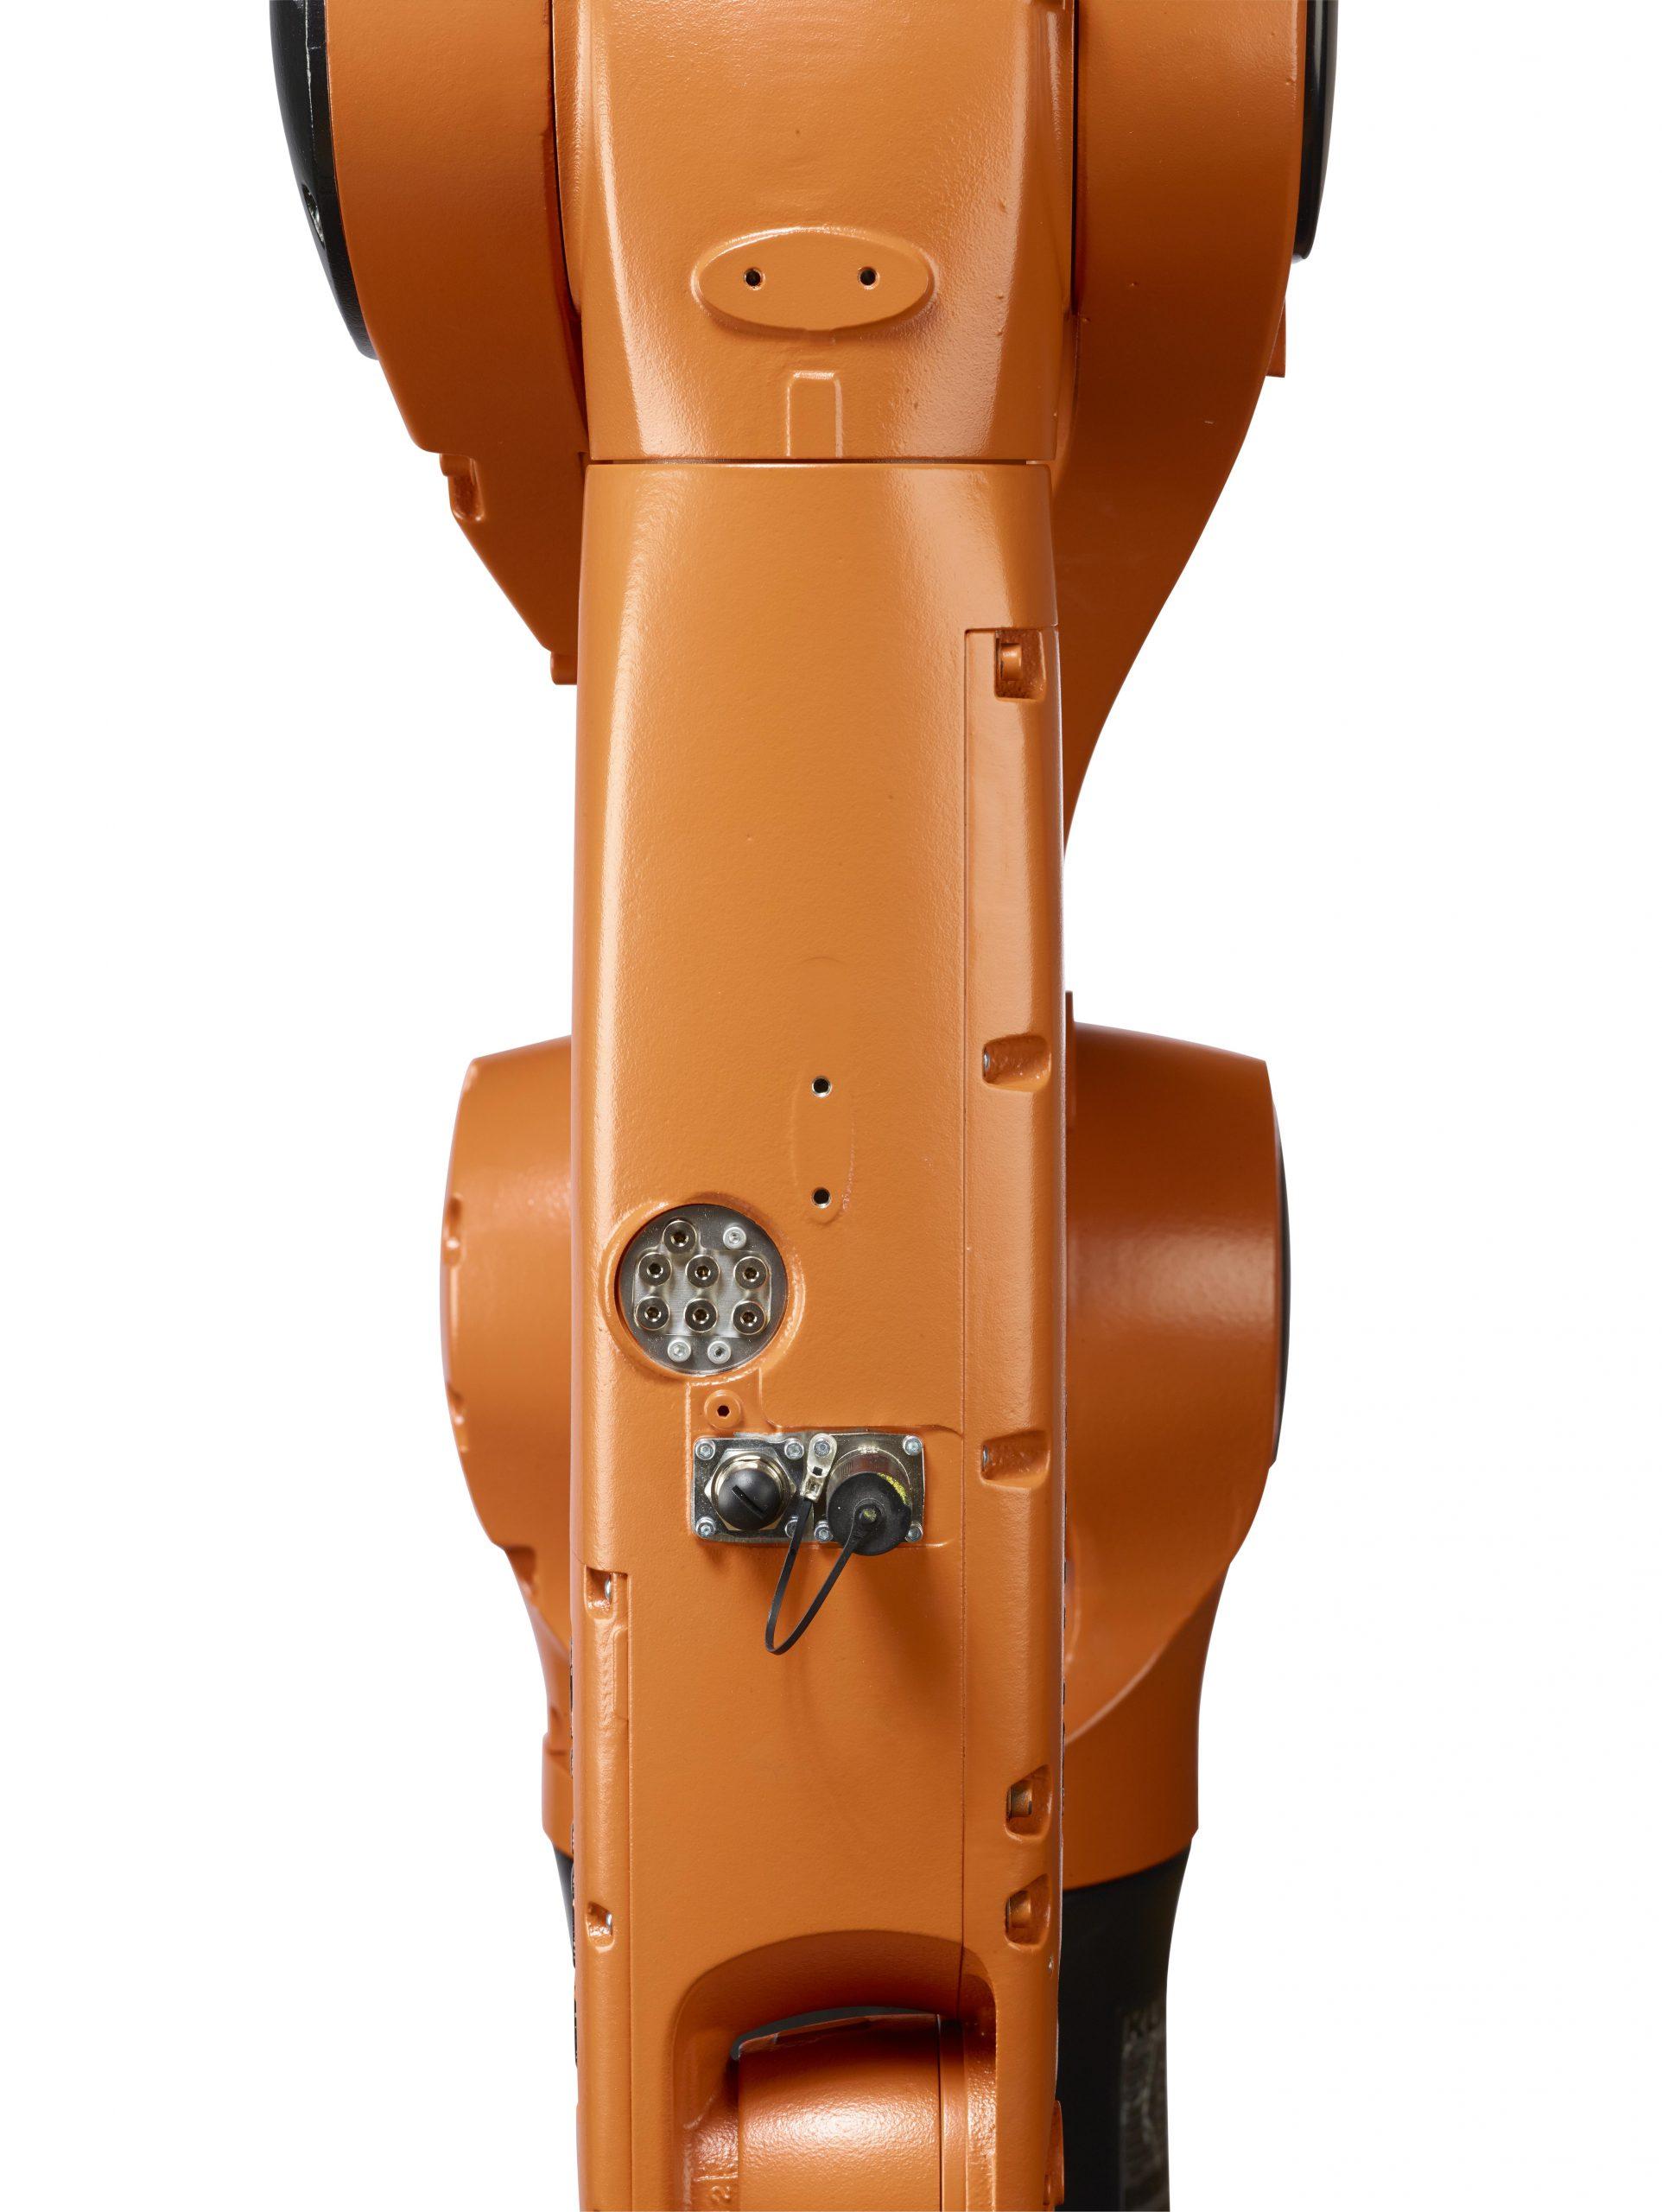 KUKA KR 10 R900 sixx WP (KR AGILUS)-8